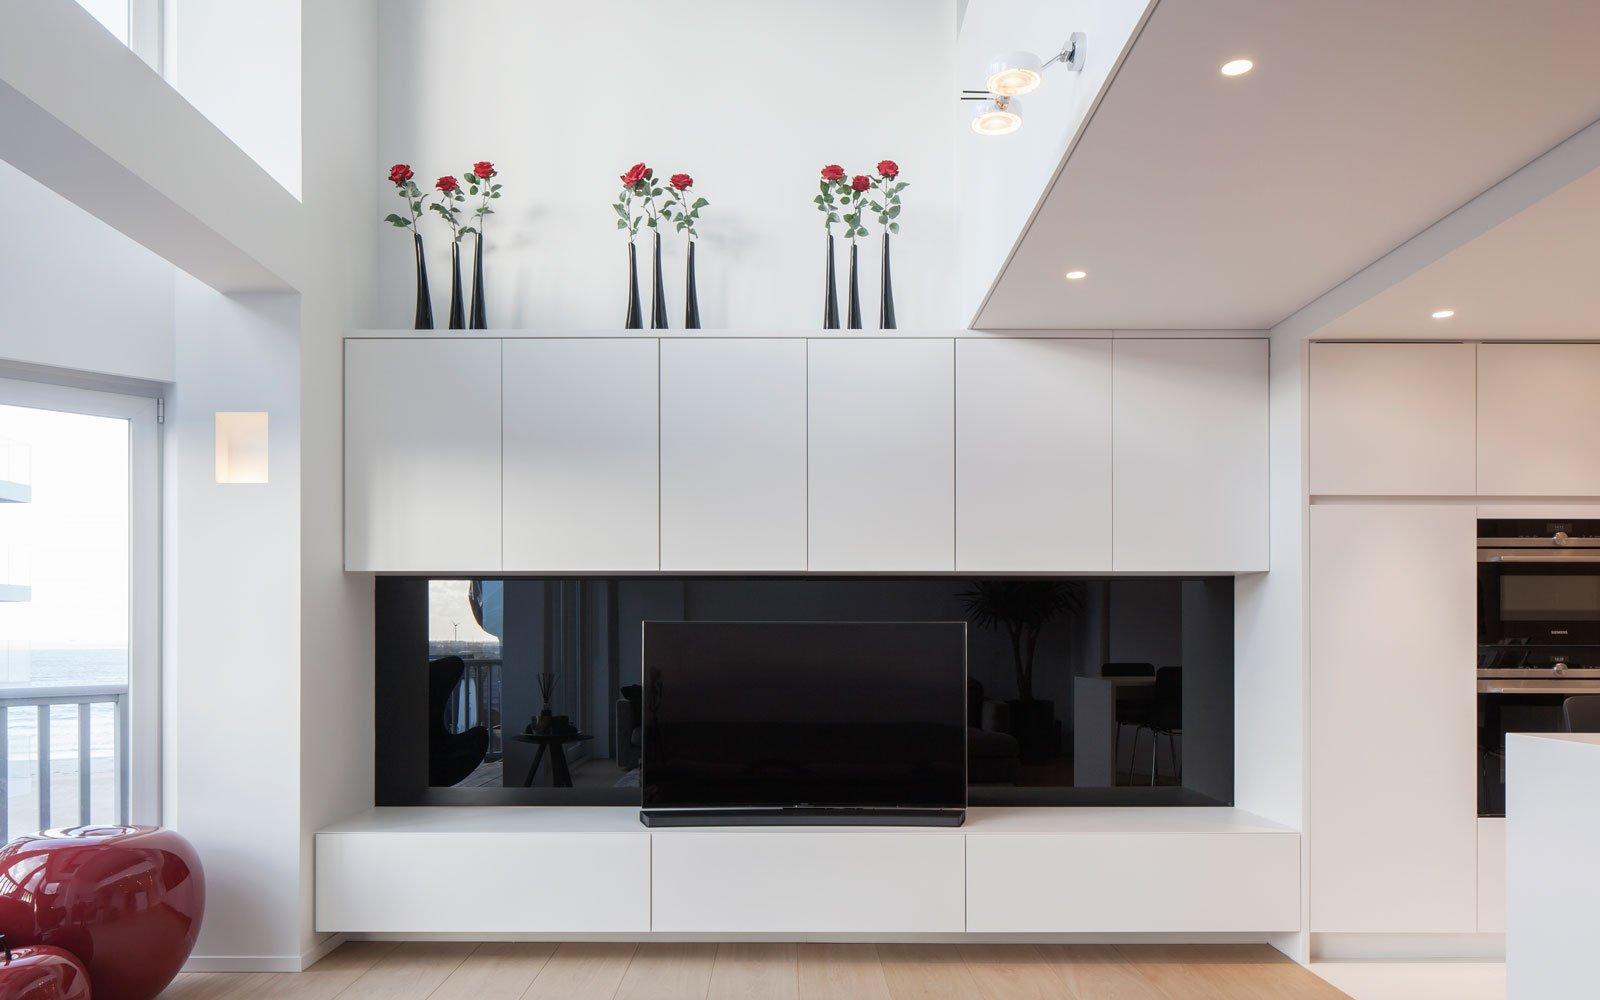 Knokse duplex stephan gunst the art of living be for Interieur maddens